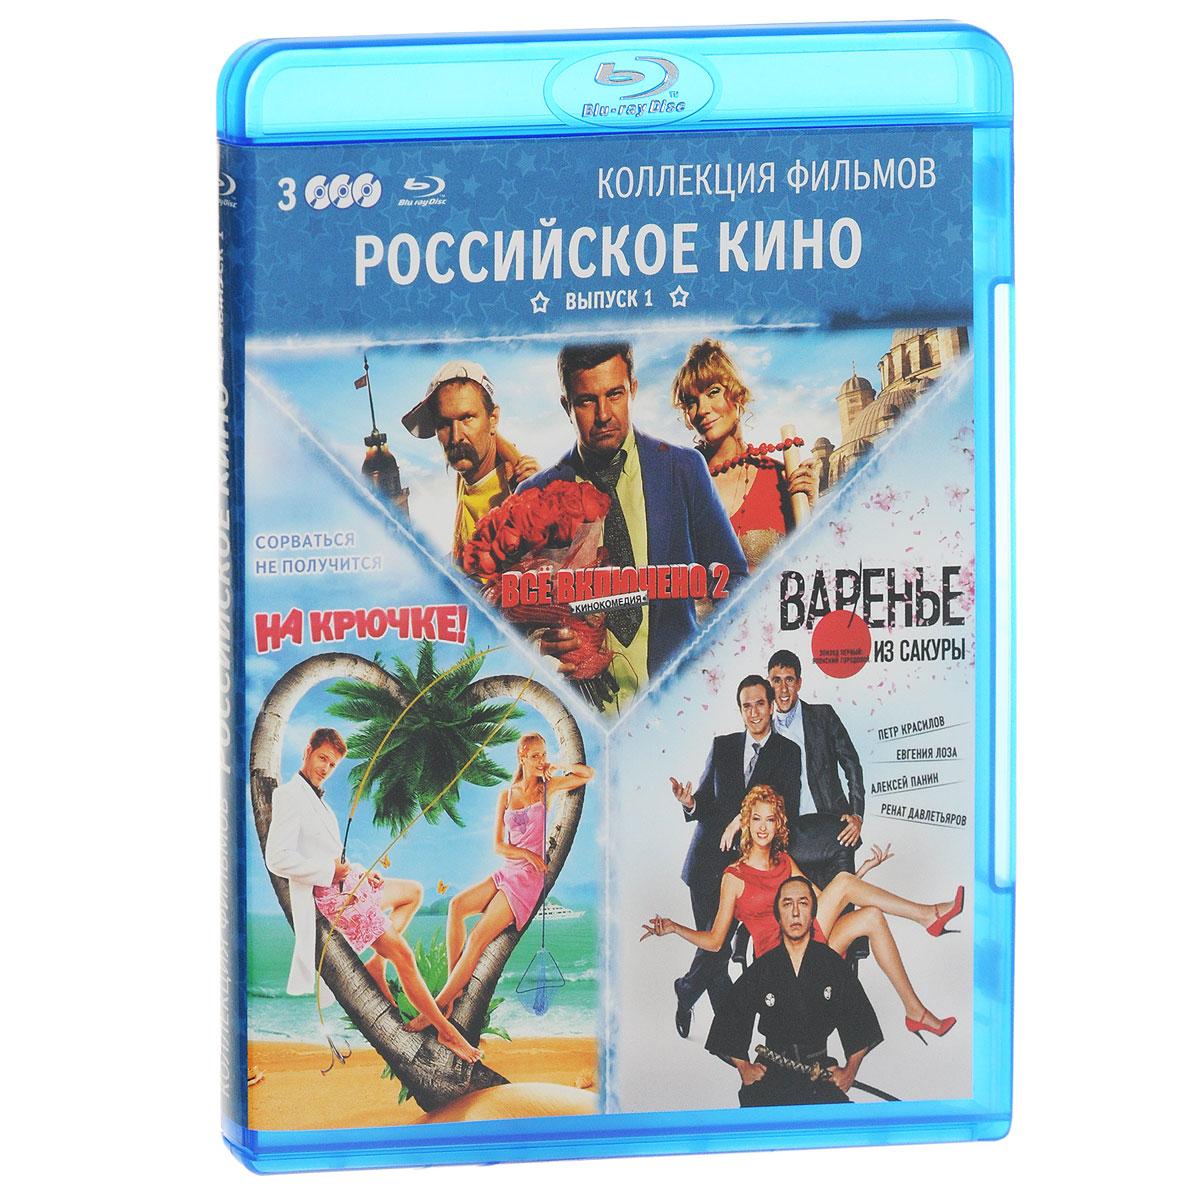 Российское кино, выпуск 1 (3 Blu-ray) blu ray плеер sony bdp s6500